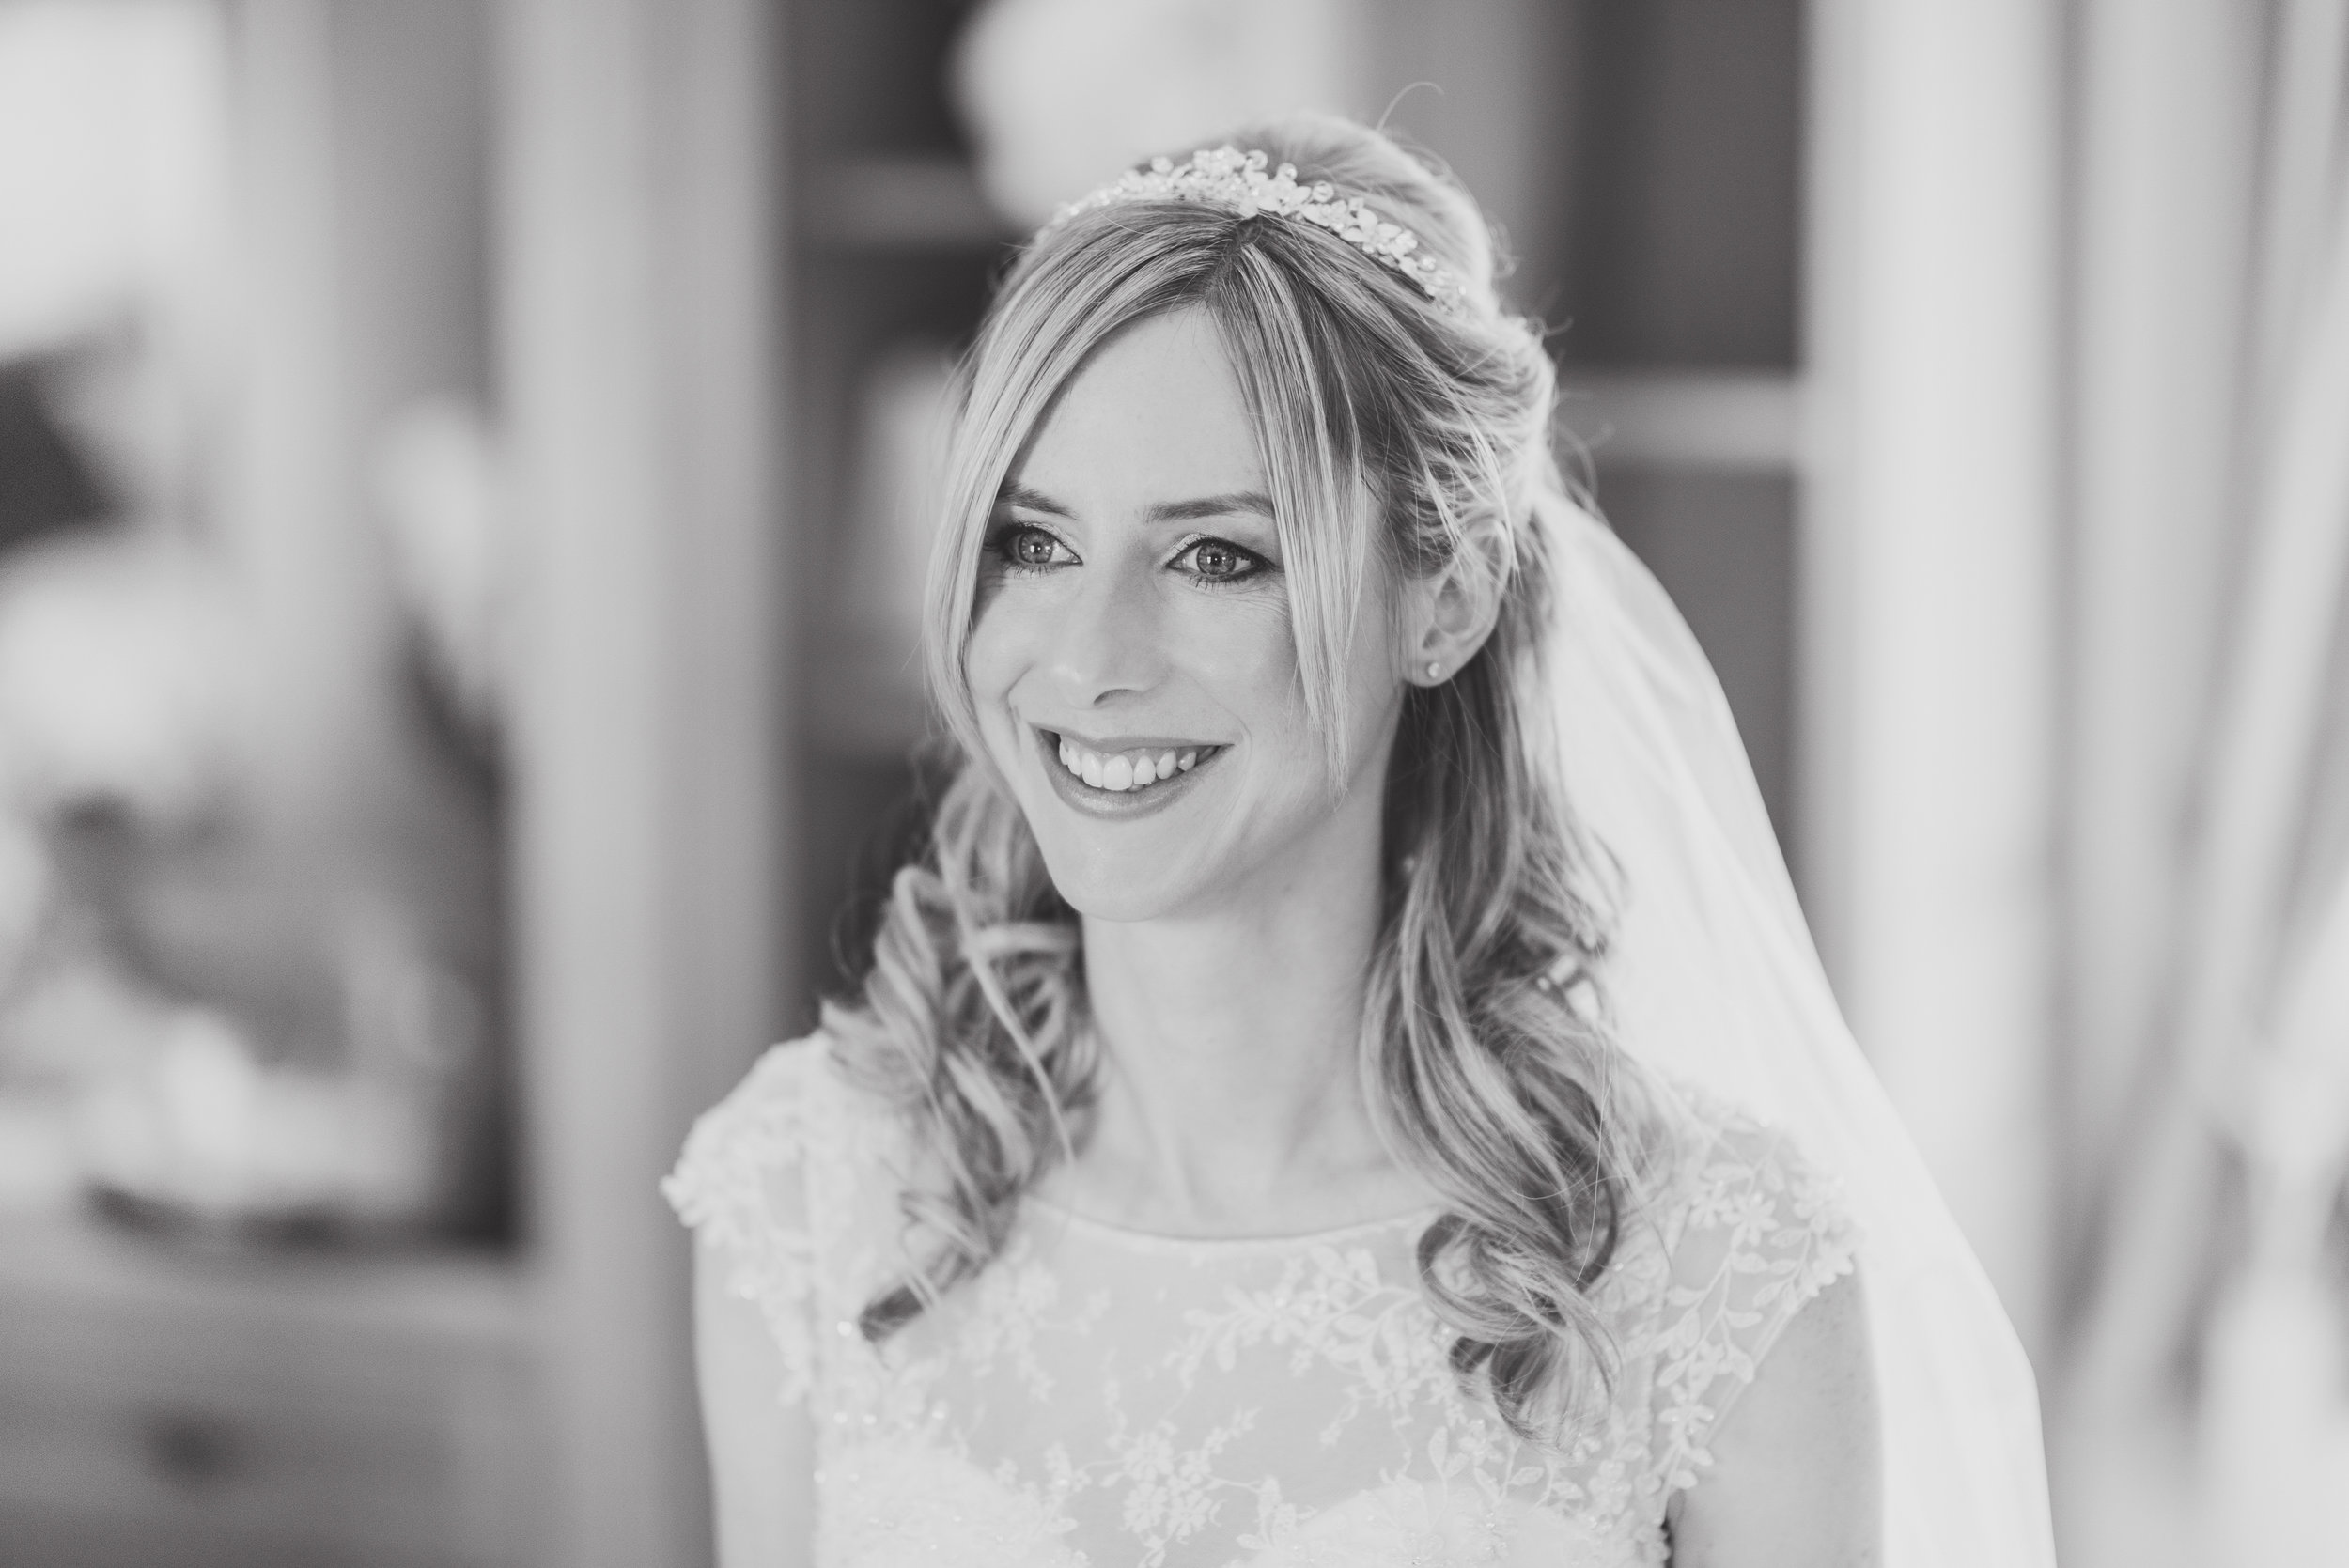 Bridal makeup artist Nottingham wedding day makeup services